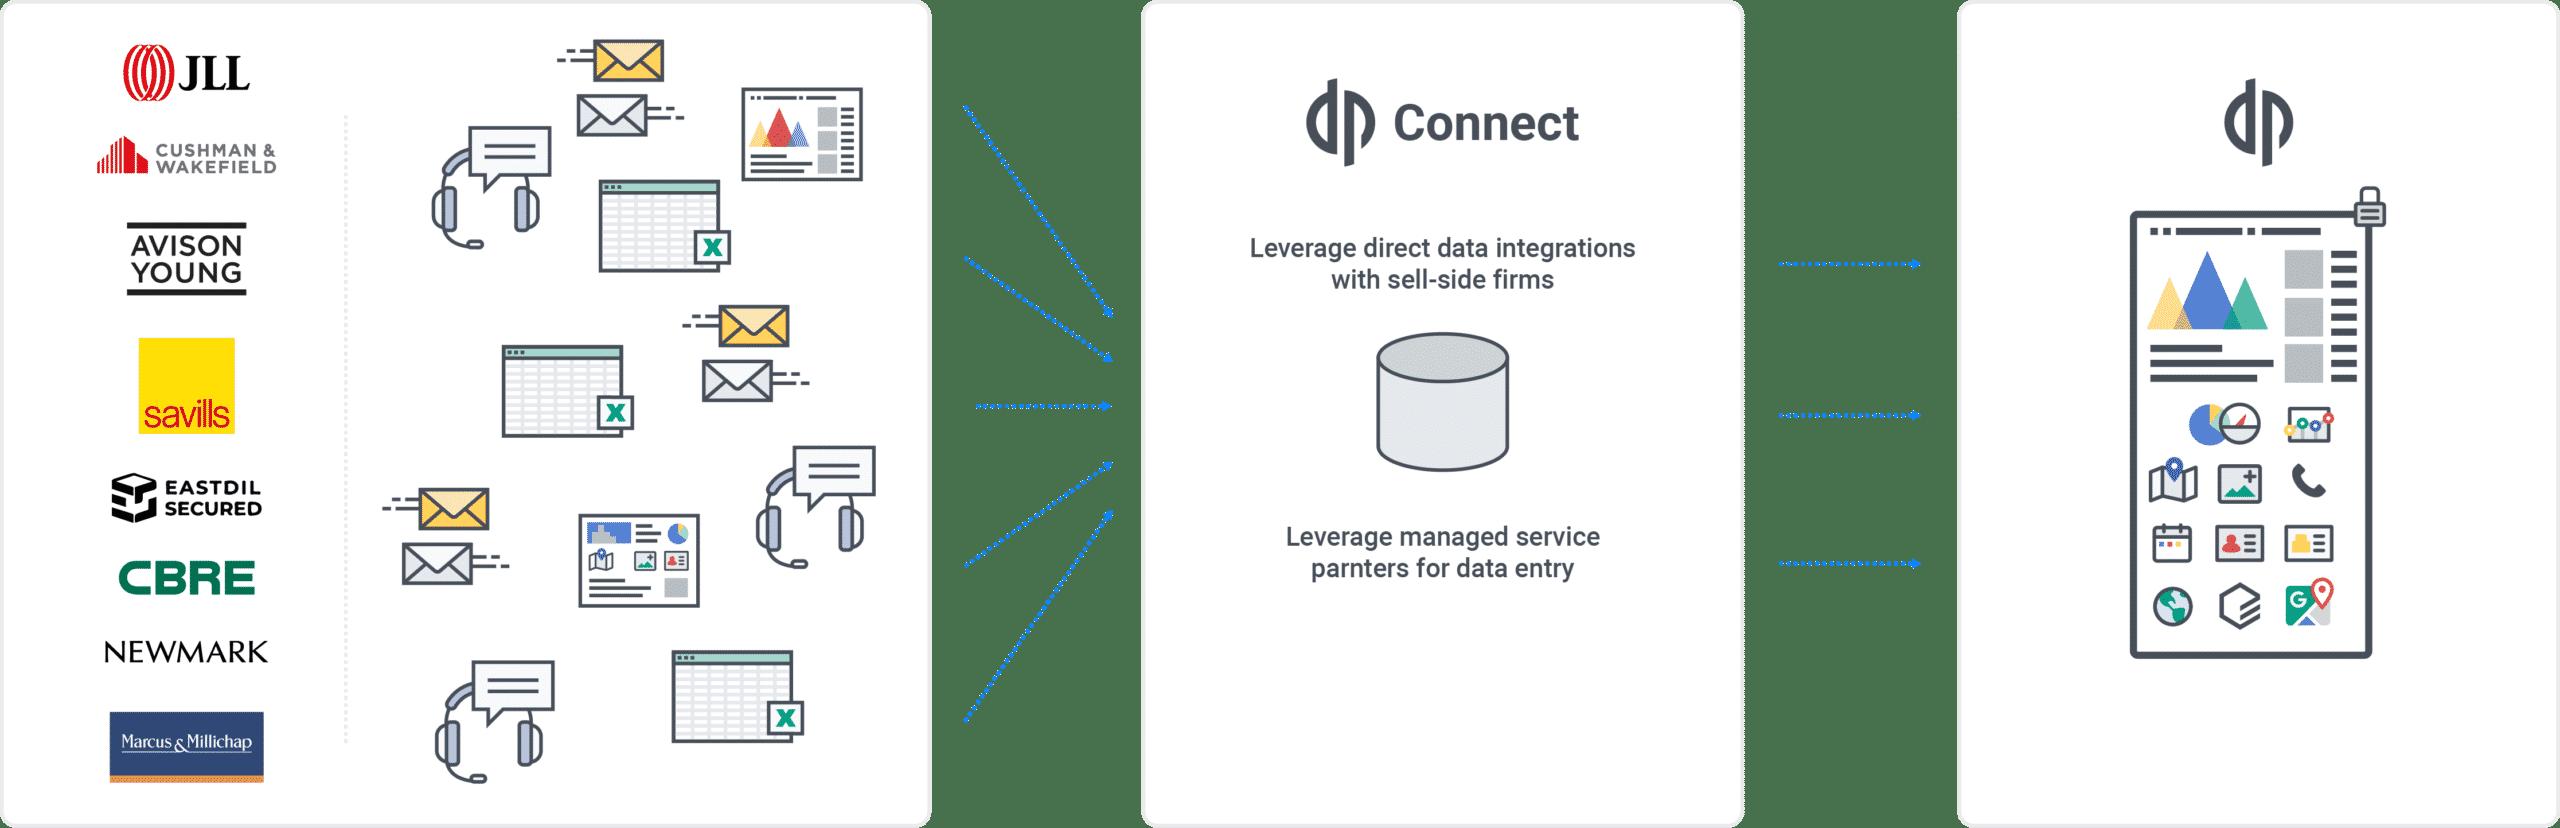 DP Connect